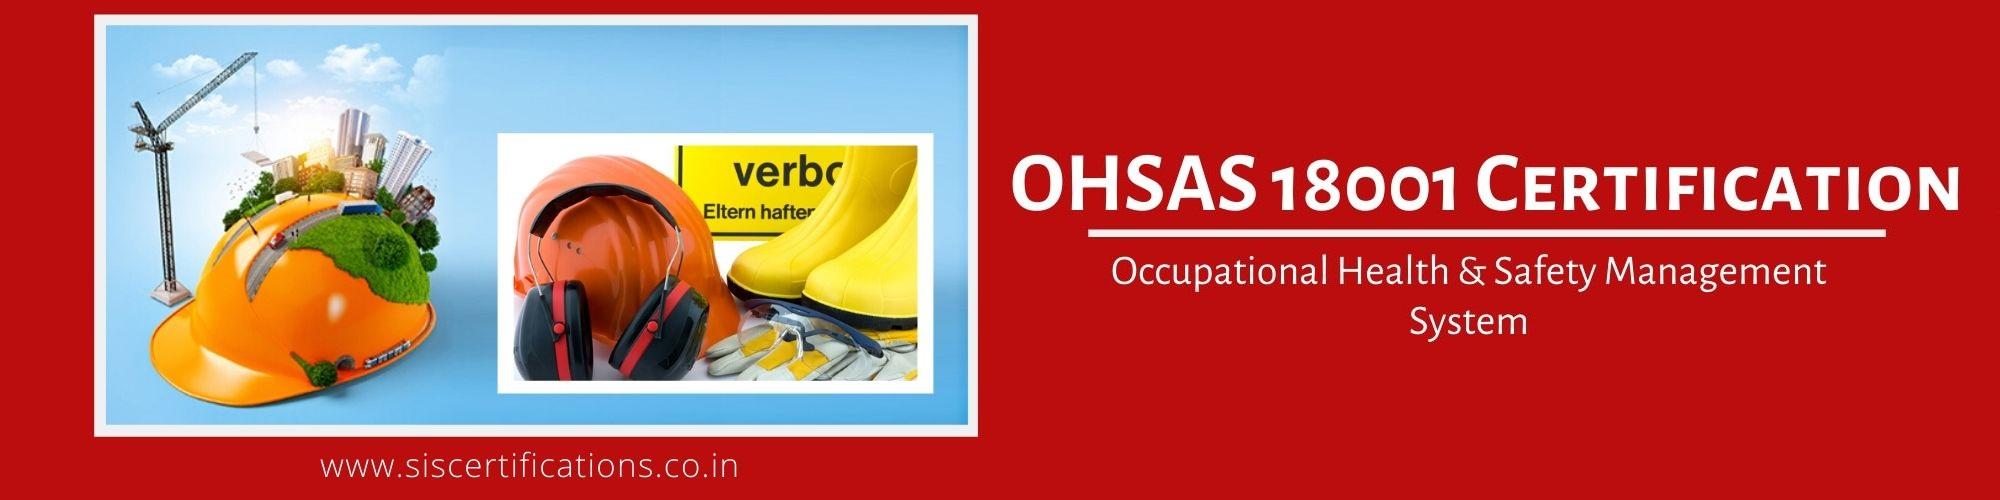 OHSAS 18001 Certification;